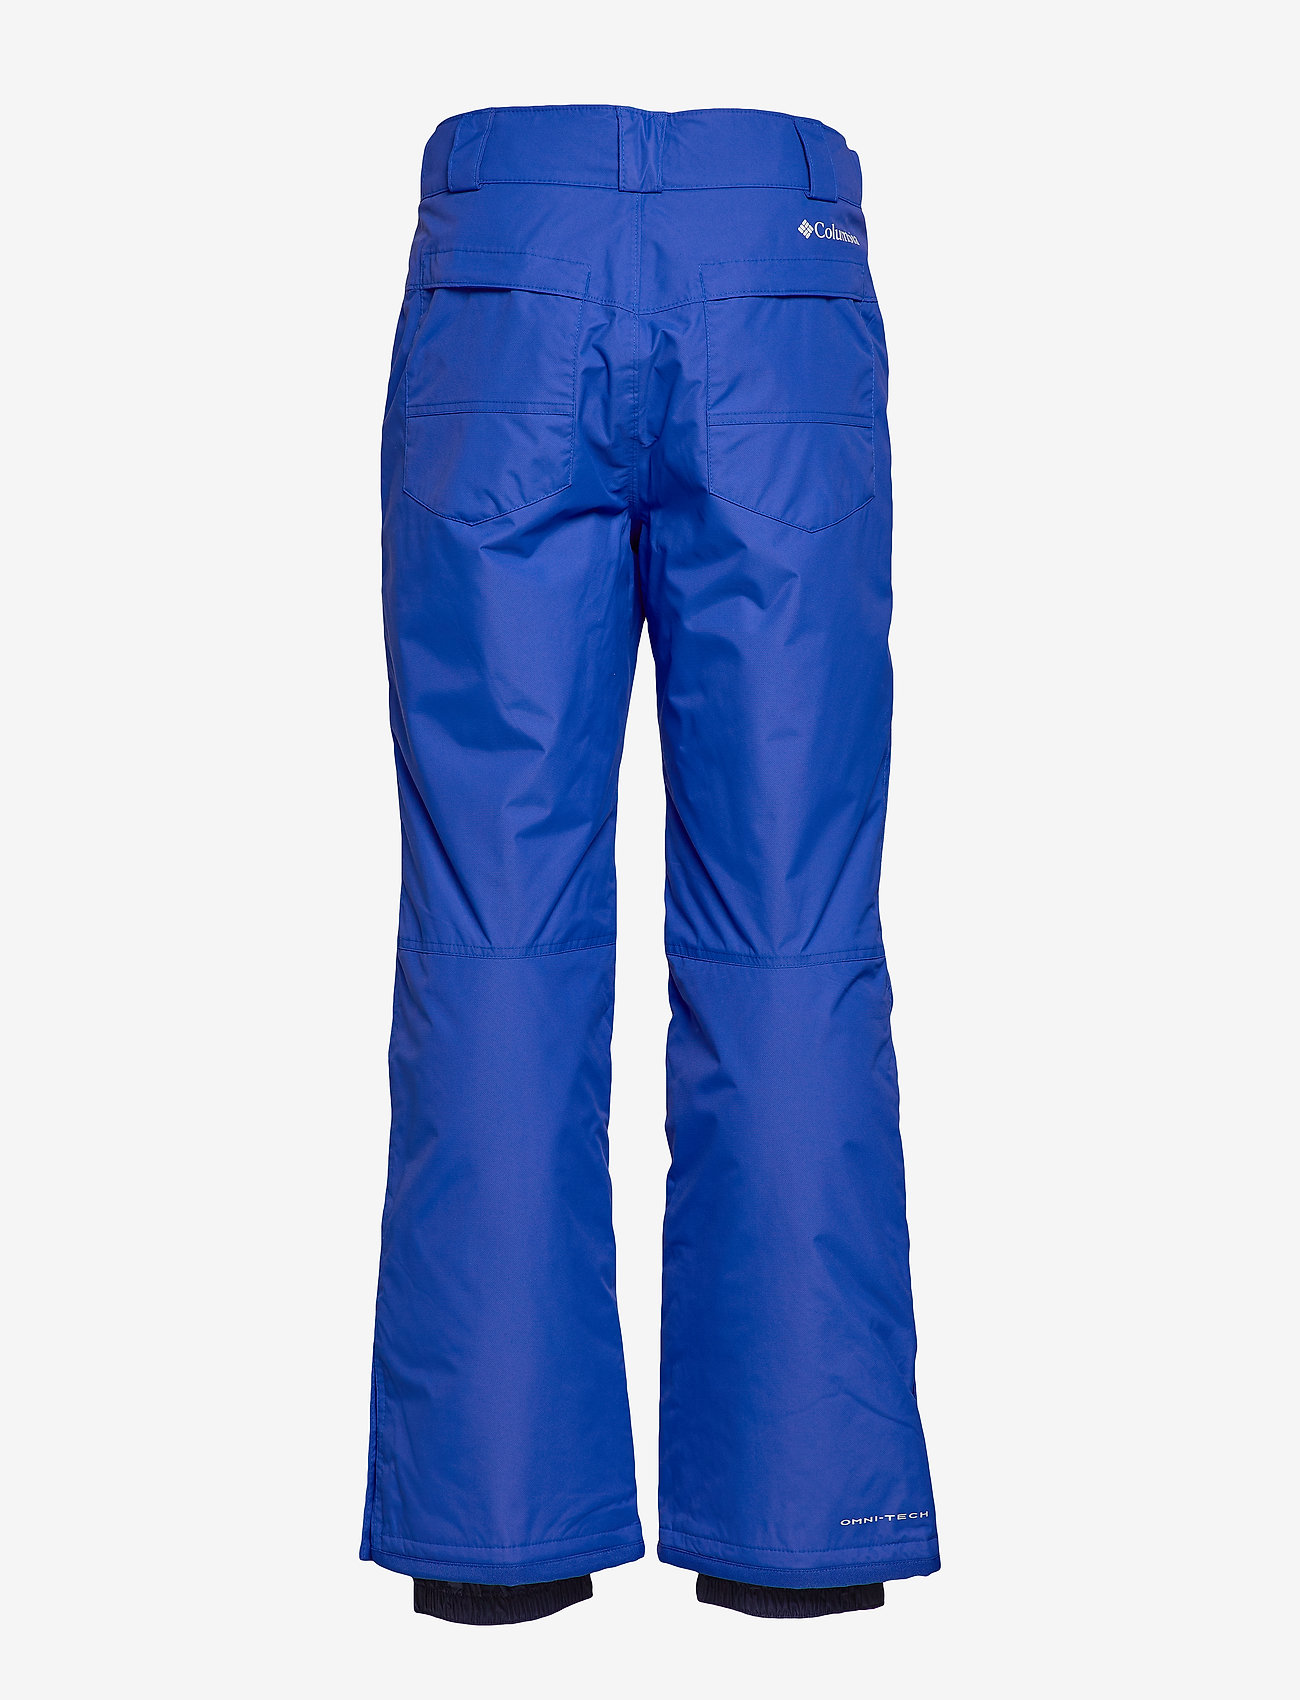 Columbia - Bugaboo IV Pant - spodnie narciarskie - azul - 1